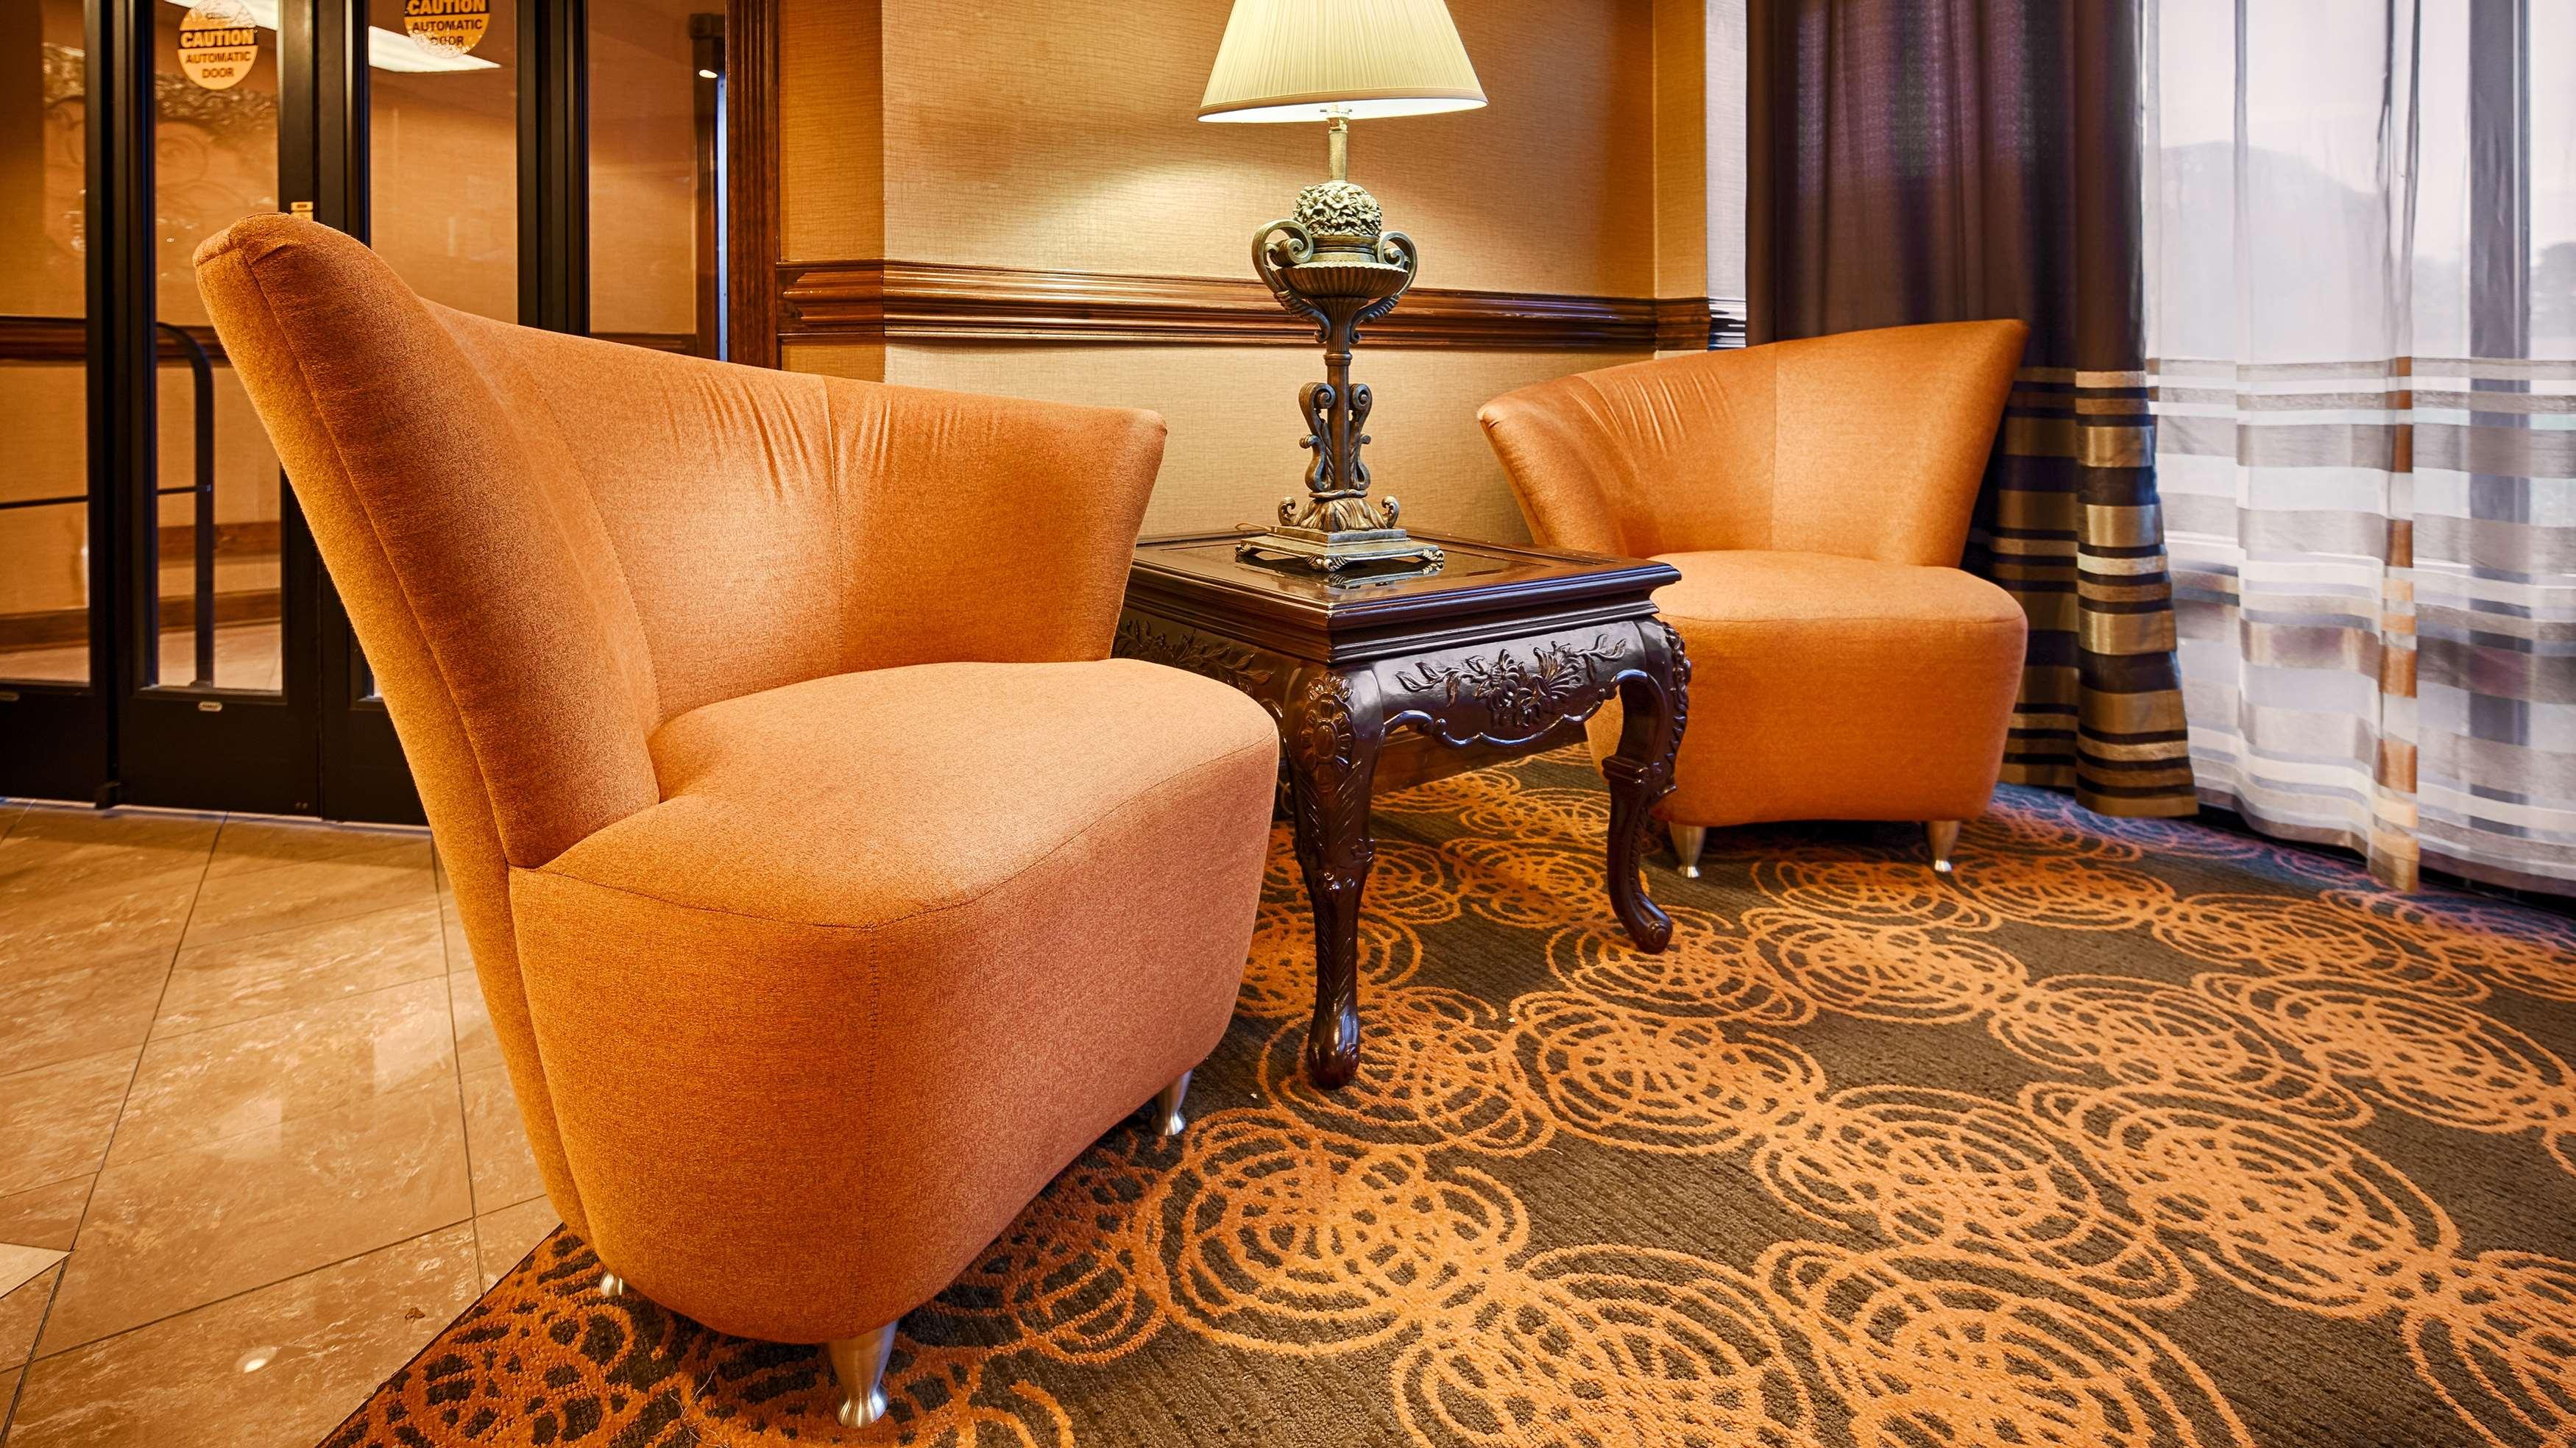 Best Western Plus Greensboro Airport Hotel image 3